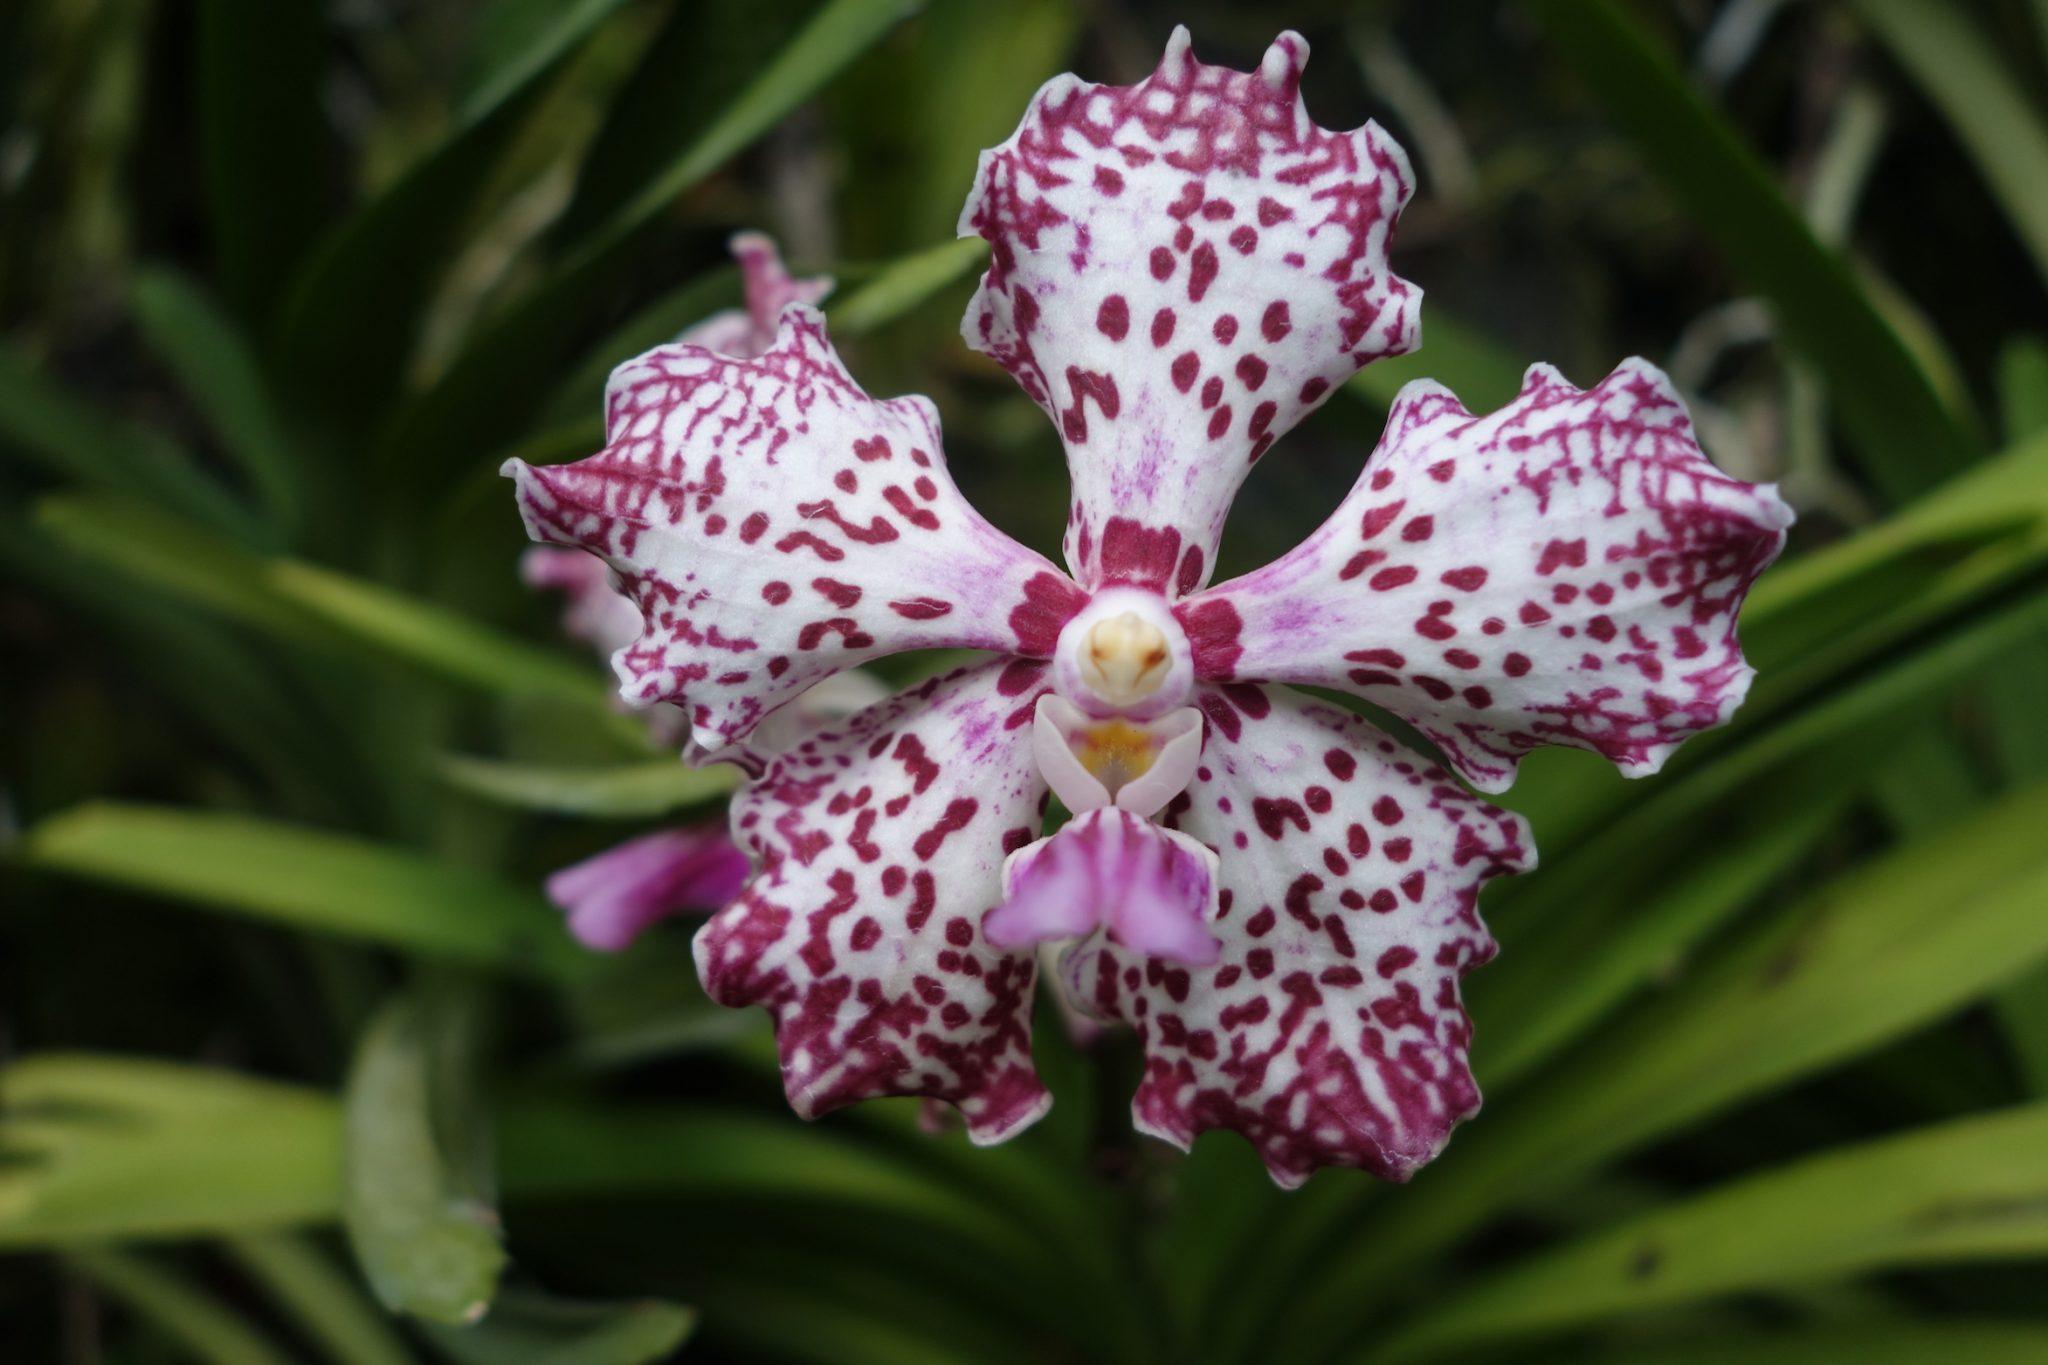 Singapur_BotanicGardens_5_Orchideen